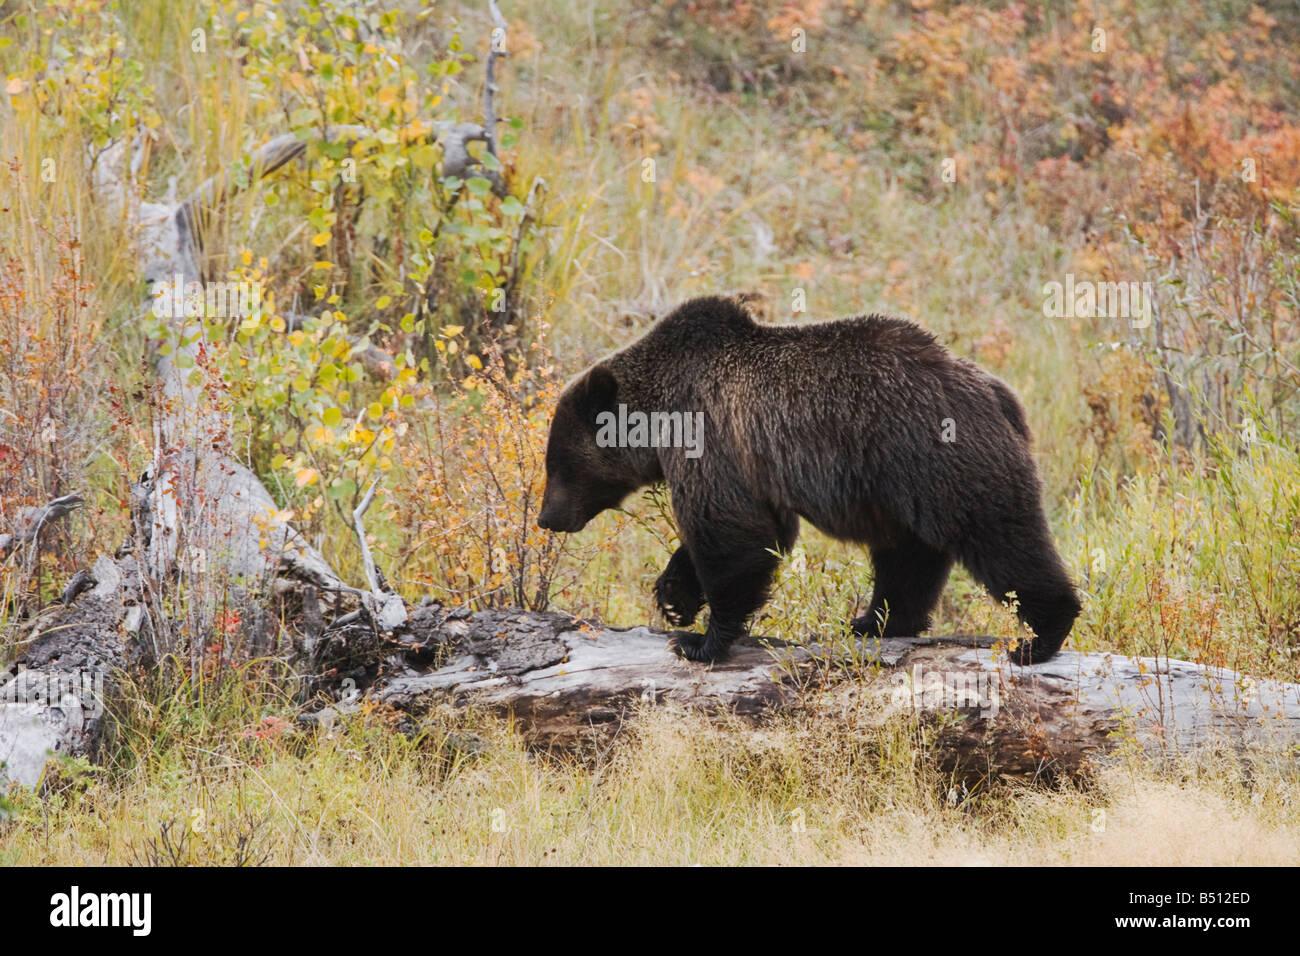 Grizzly Bear Ursus arctos horribilis adult Yellowstone National Park Wyoming USA Stock Photo